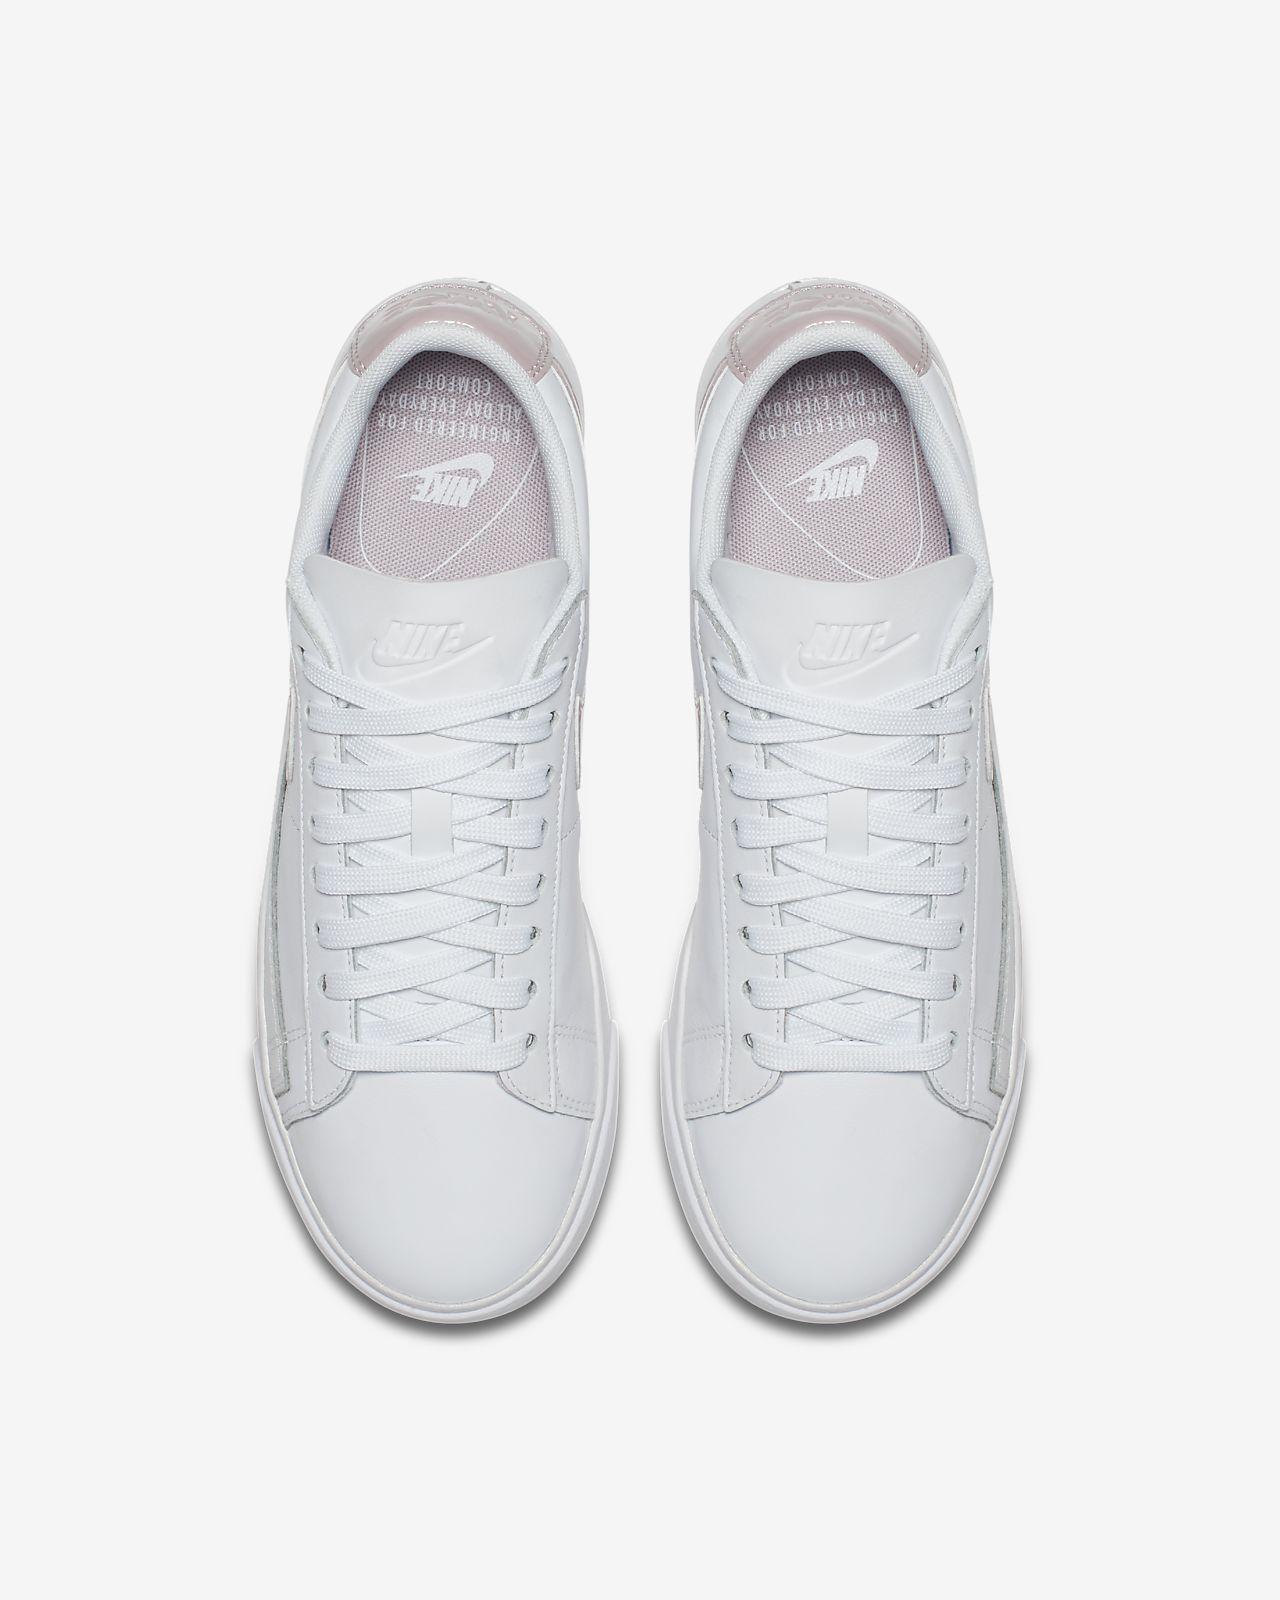 8fa4a946c ... premium black wholly black denmark nike blazer low le womens shoe 89f35  3b21c ...